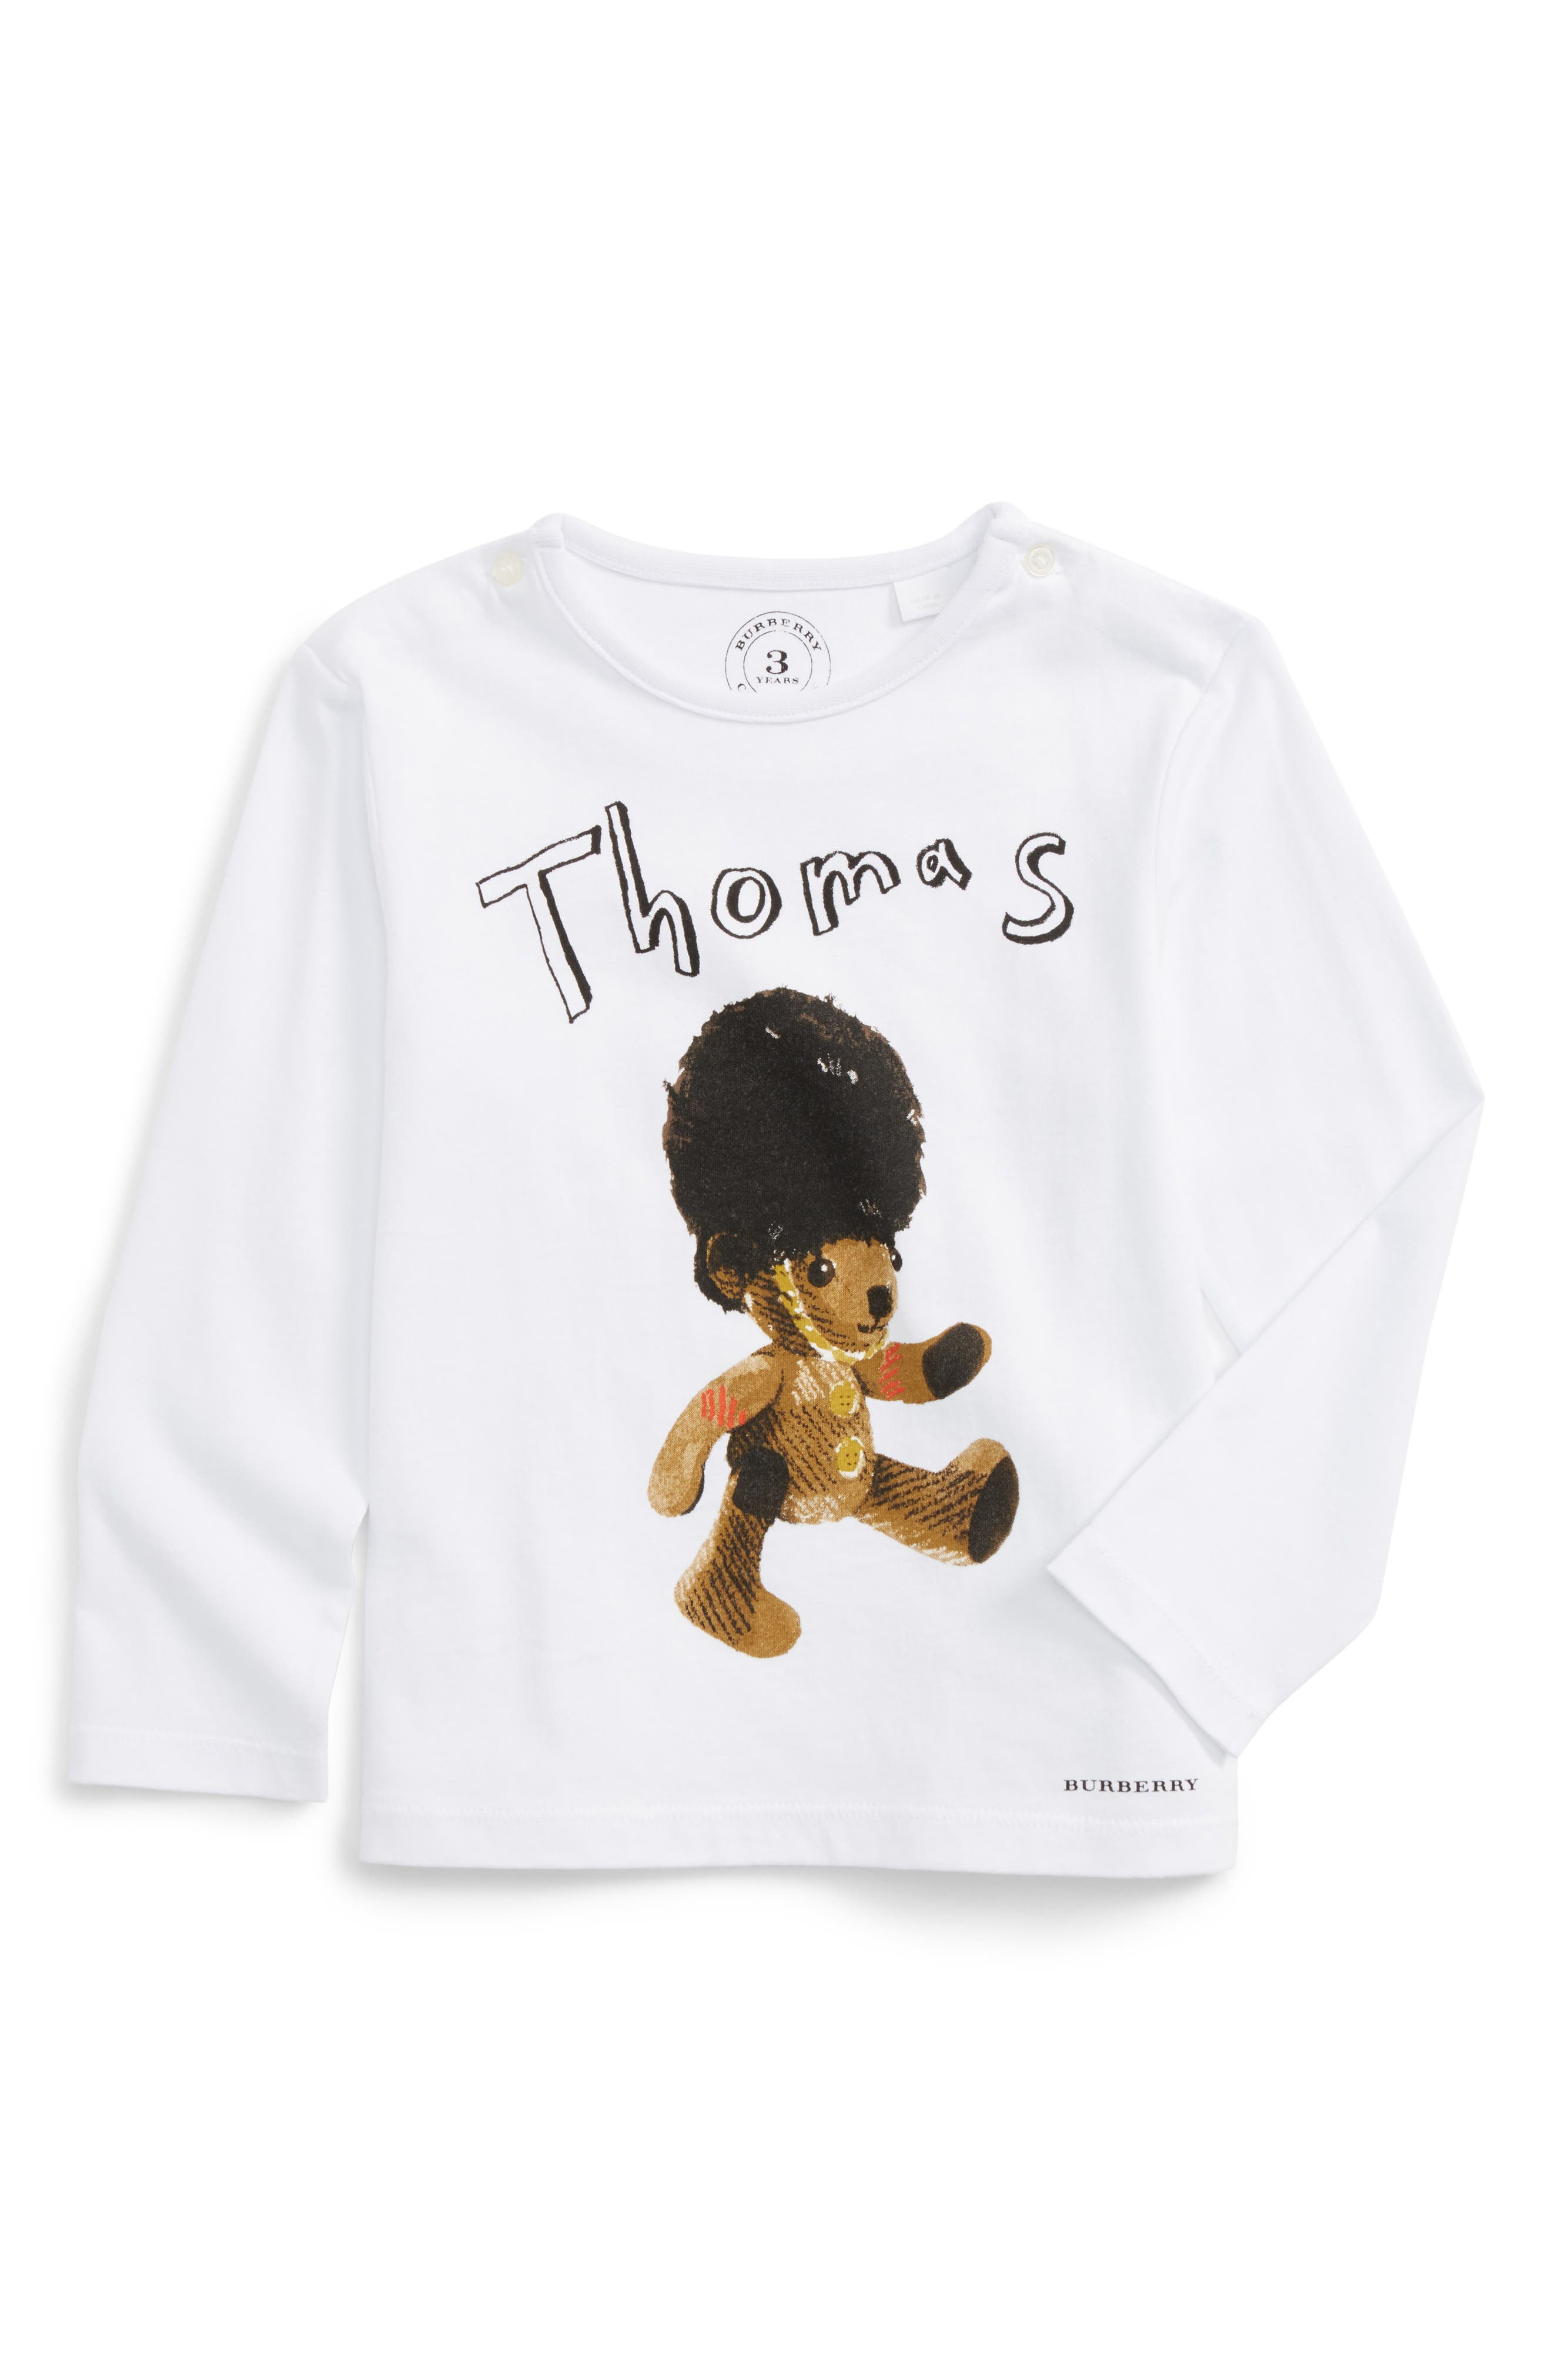 Alternate Image 1 Selected - Burberry Thomas Bear Graphic T-Shirt (Toddler Boys)